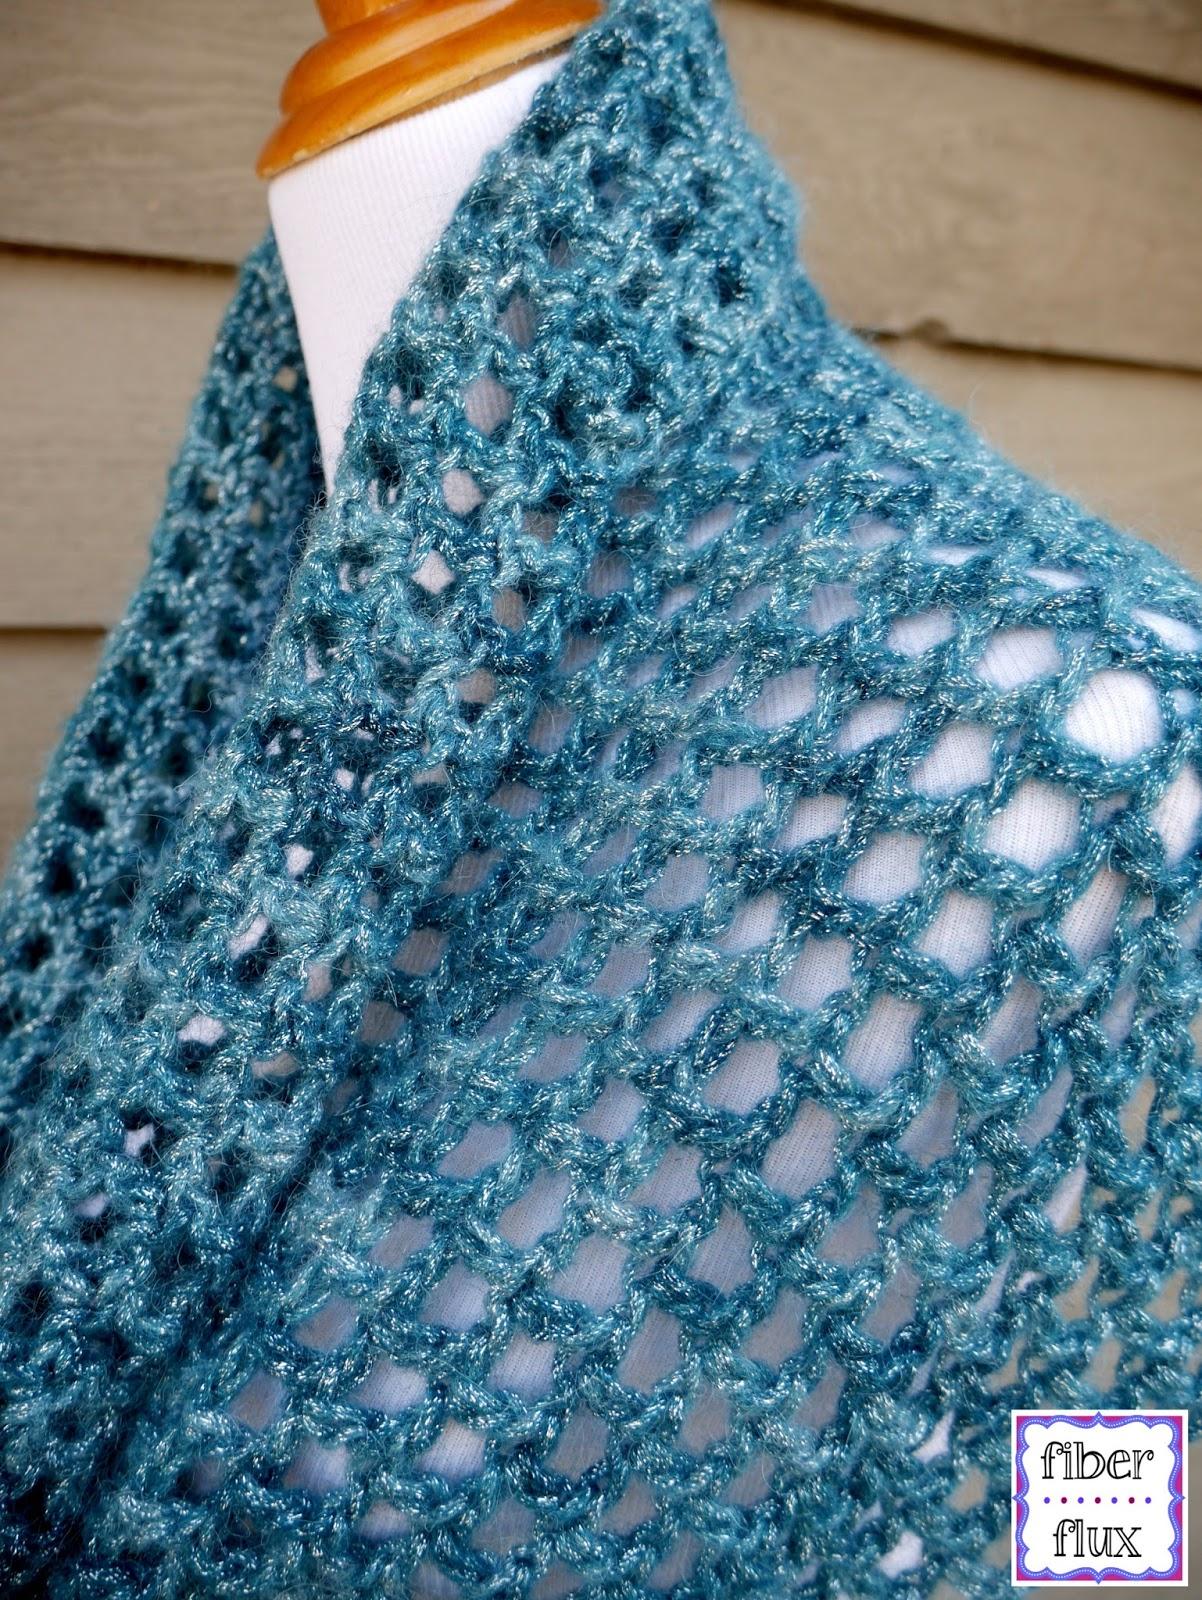 Fiber Flux Free Crochet Pattern Ocean Shimmer Capelet Cowl